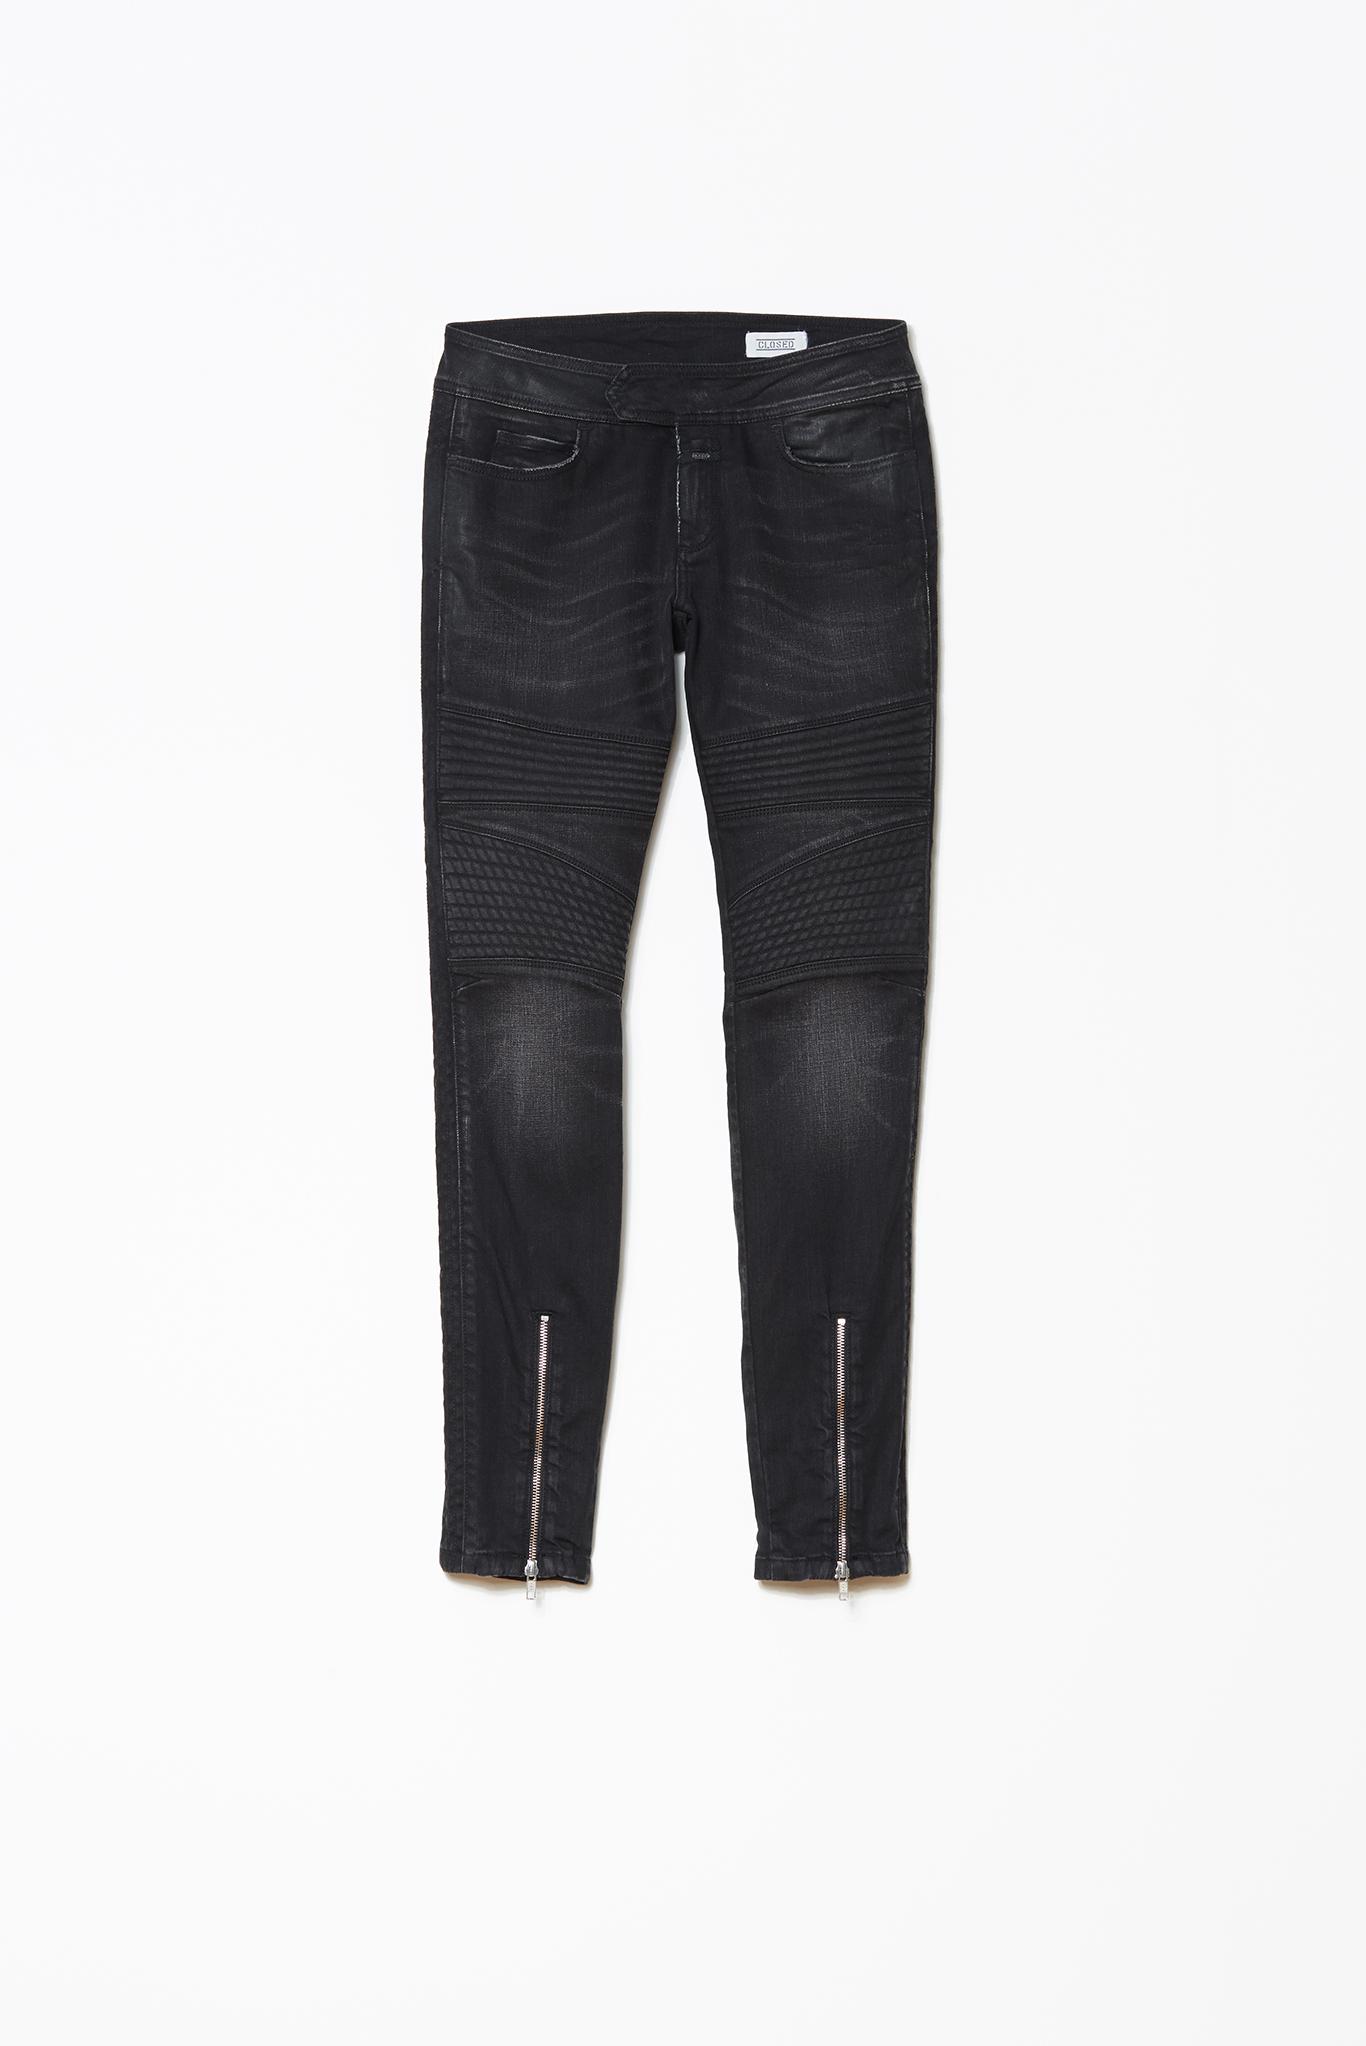 Closed | Ivy Skinny-Leg Waxed Denim-Pants | Shop